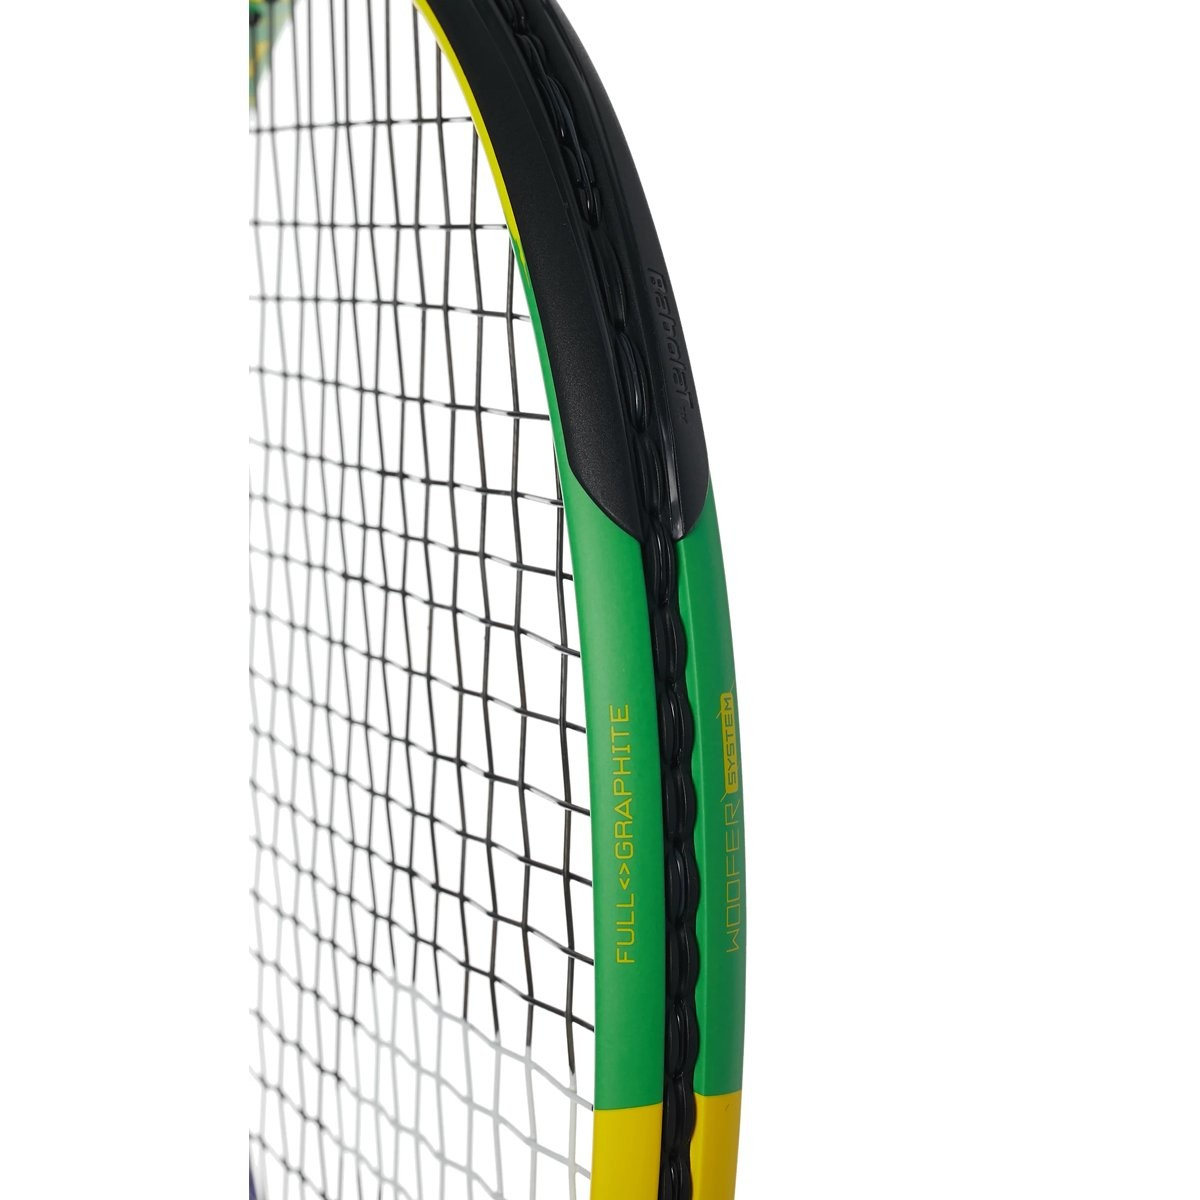 Raquete de Tênis Babolat Boost Brasil